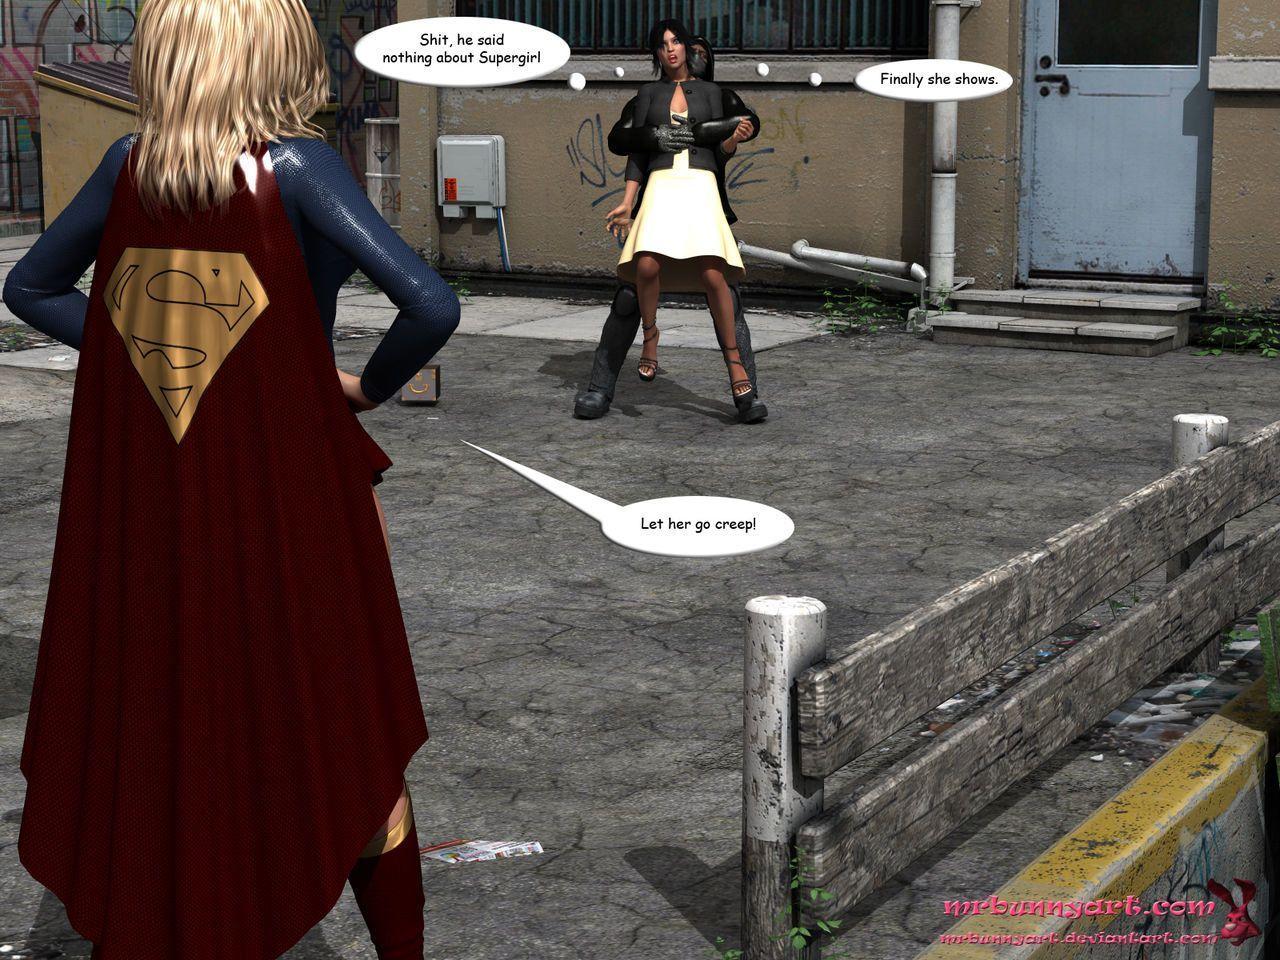 [MrBunnyArt] supergirl vs cain (supergirl) [English]